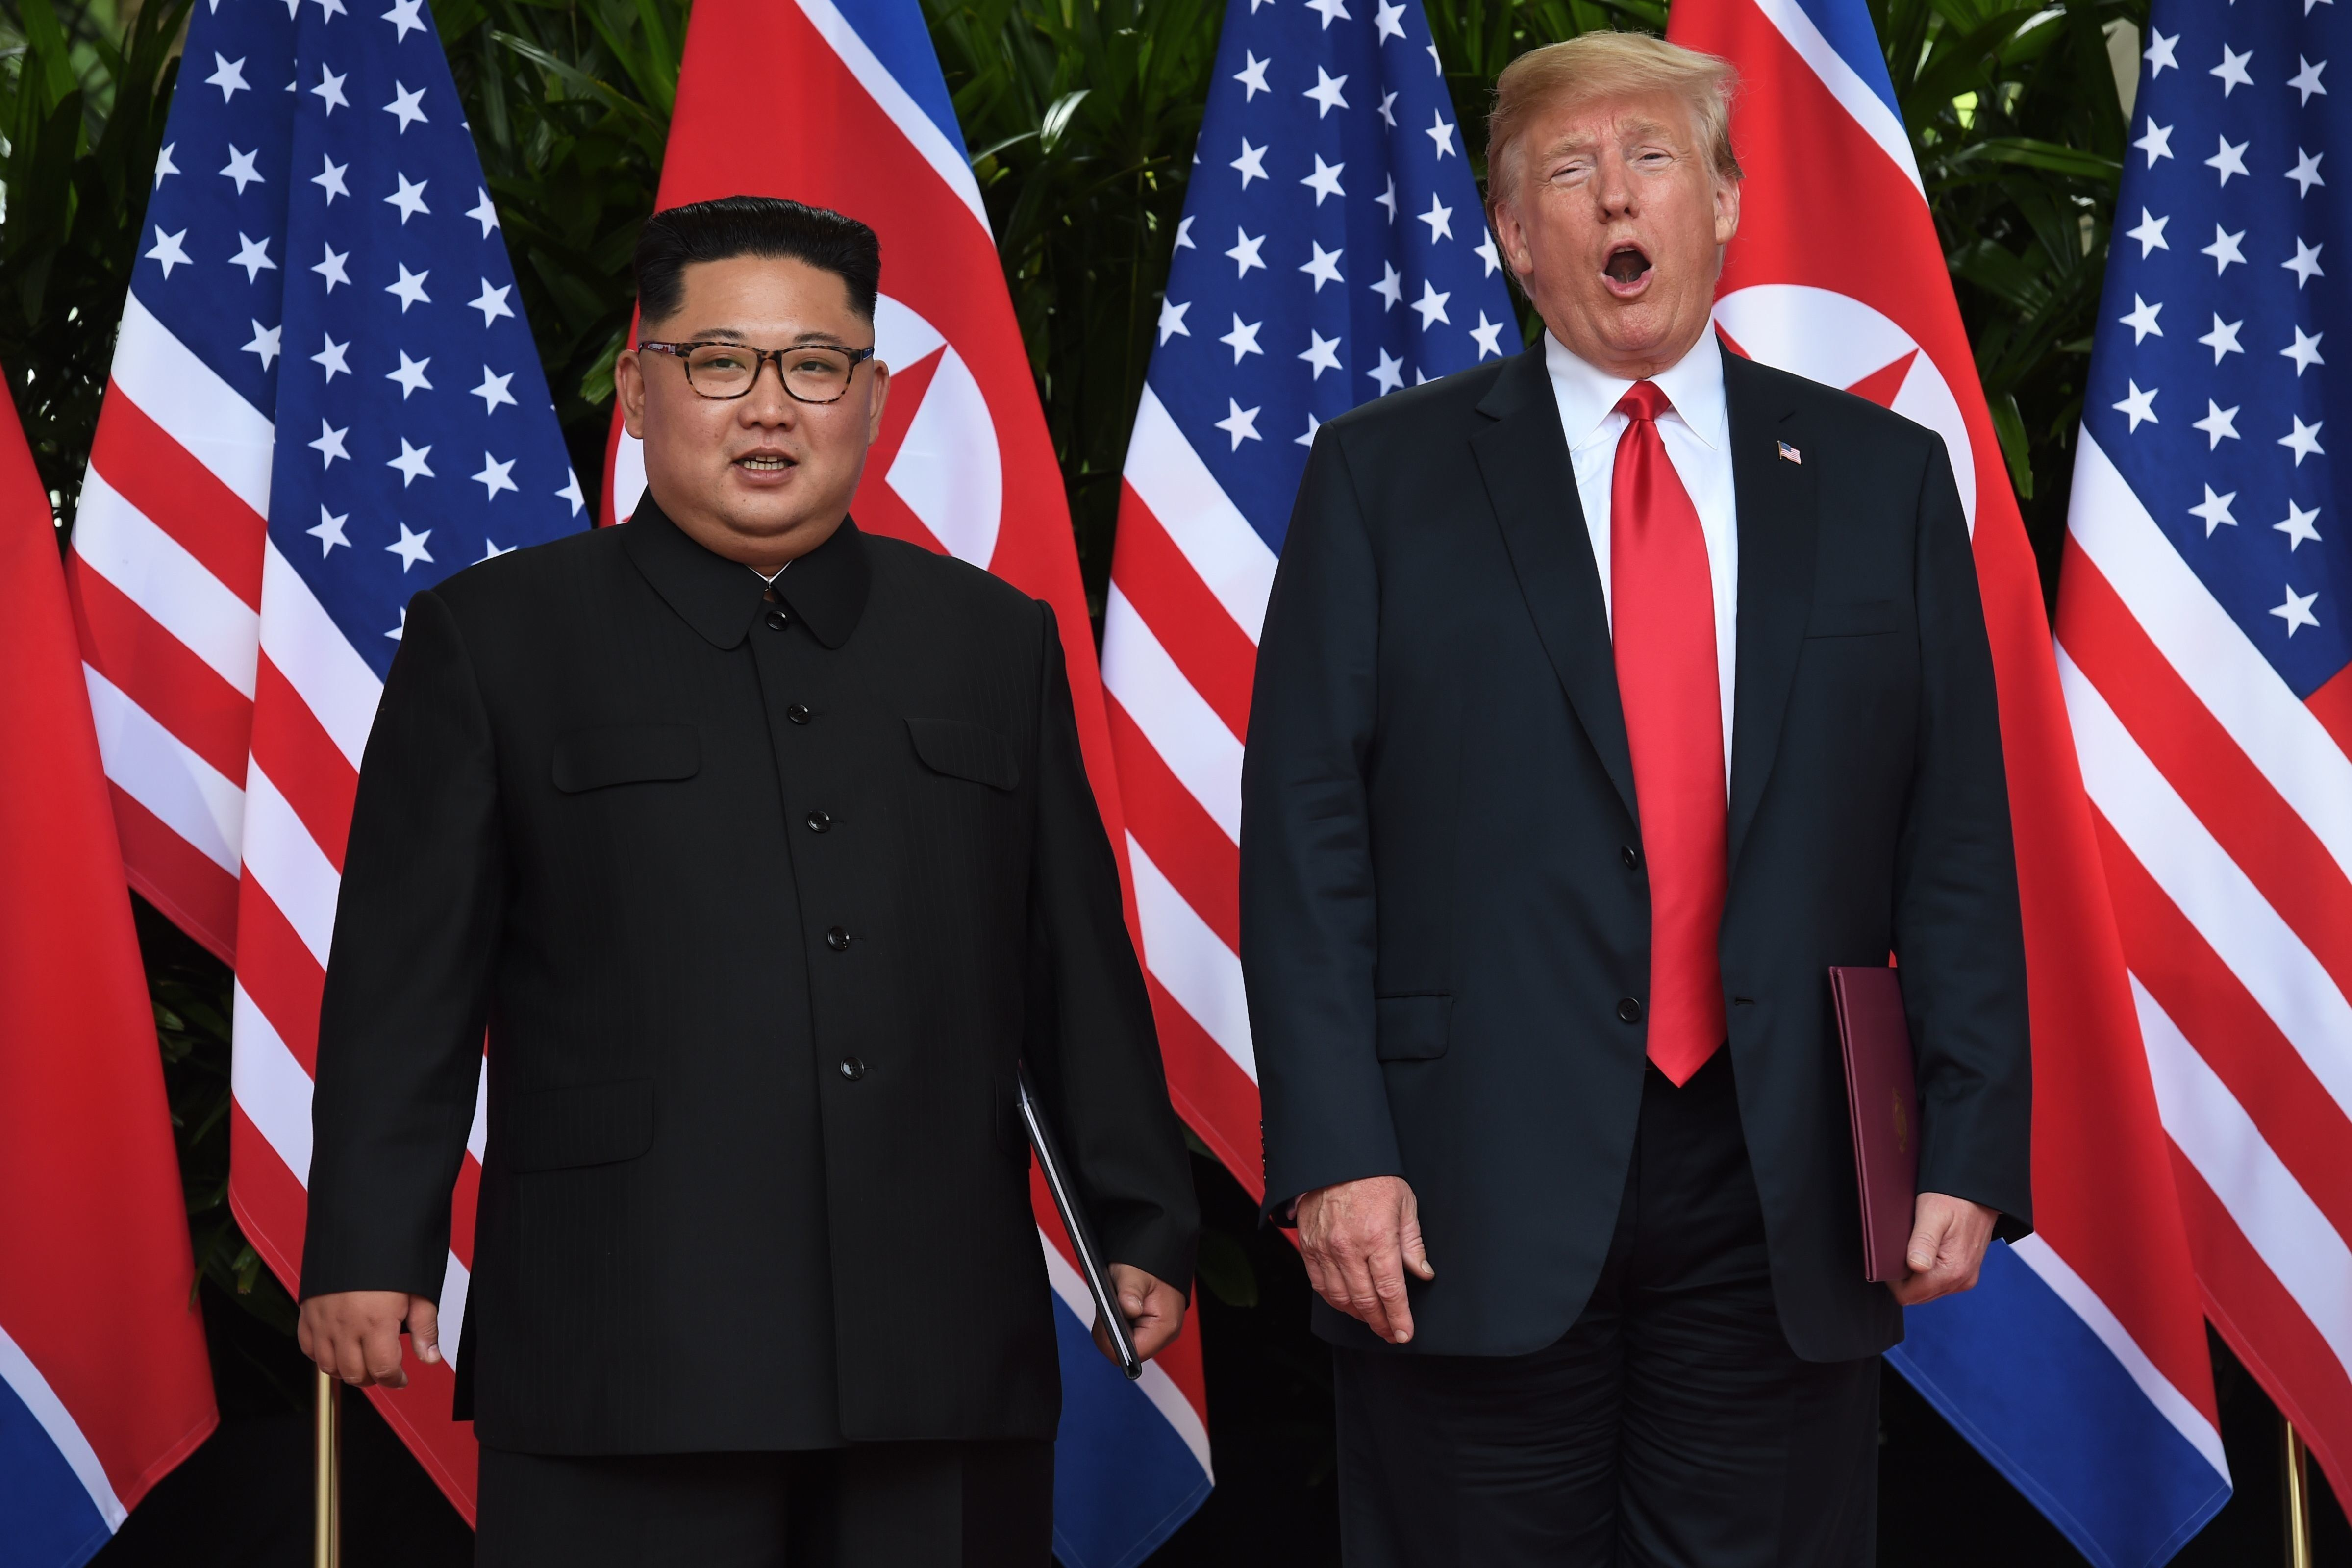 Prix Nobel de la paix 2018: comment Donald Trump et Kim Jong Un peuvent bien se retrouver